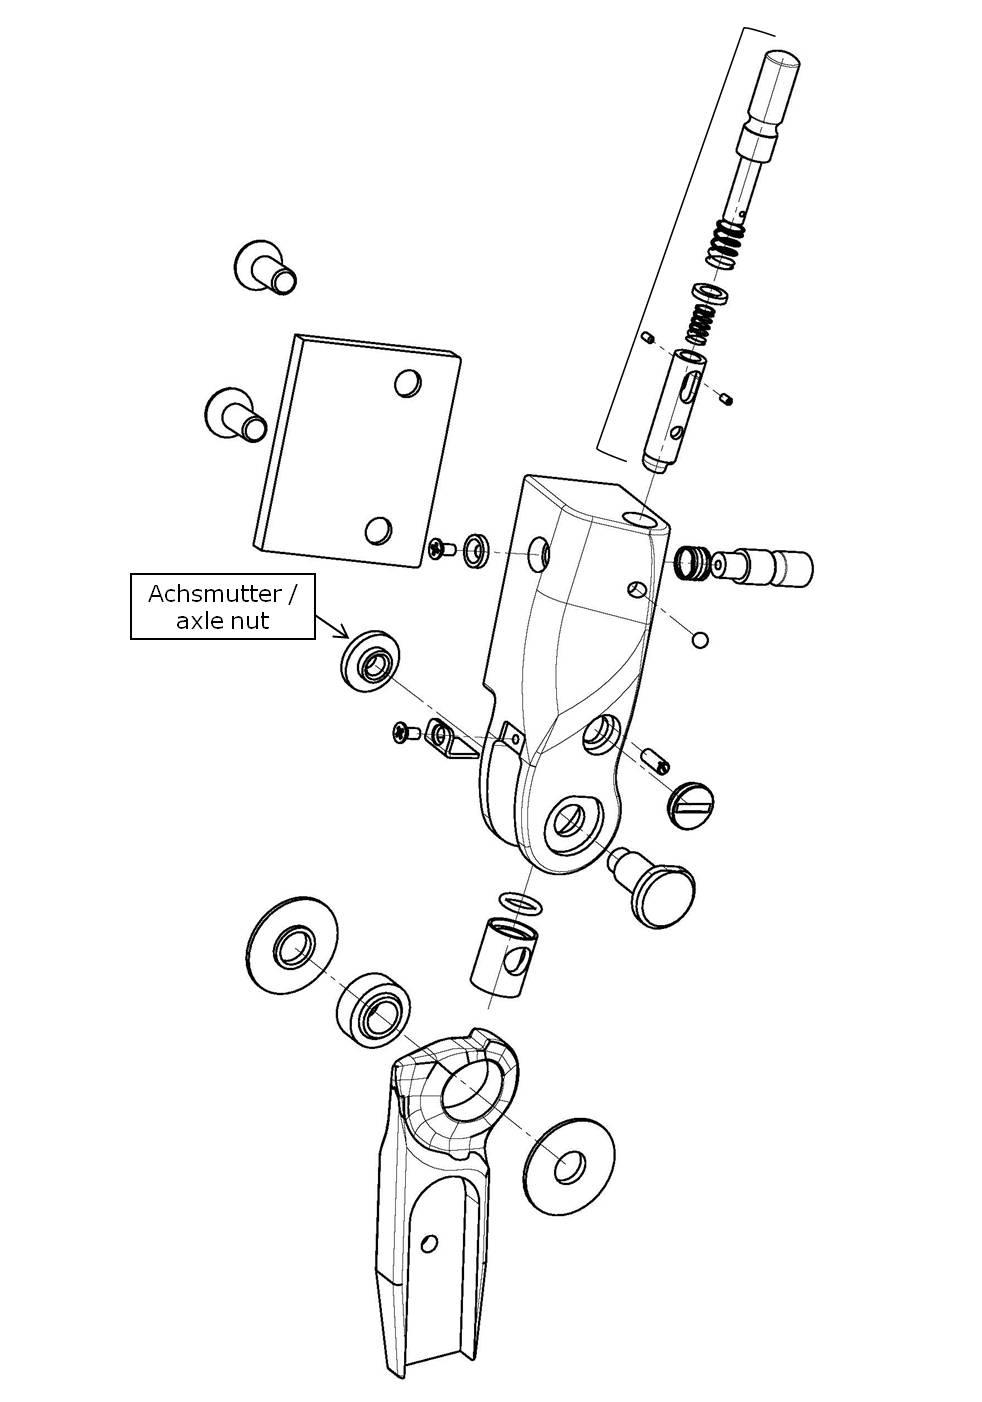 Achsmutter für das Salera preselect 3-D Hüftgelenk